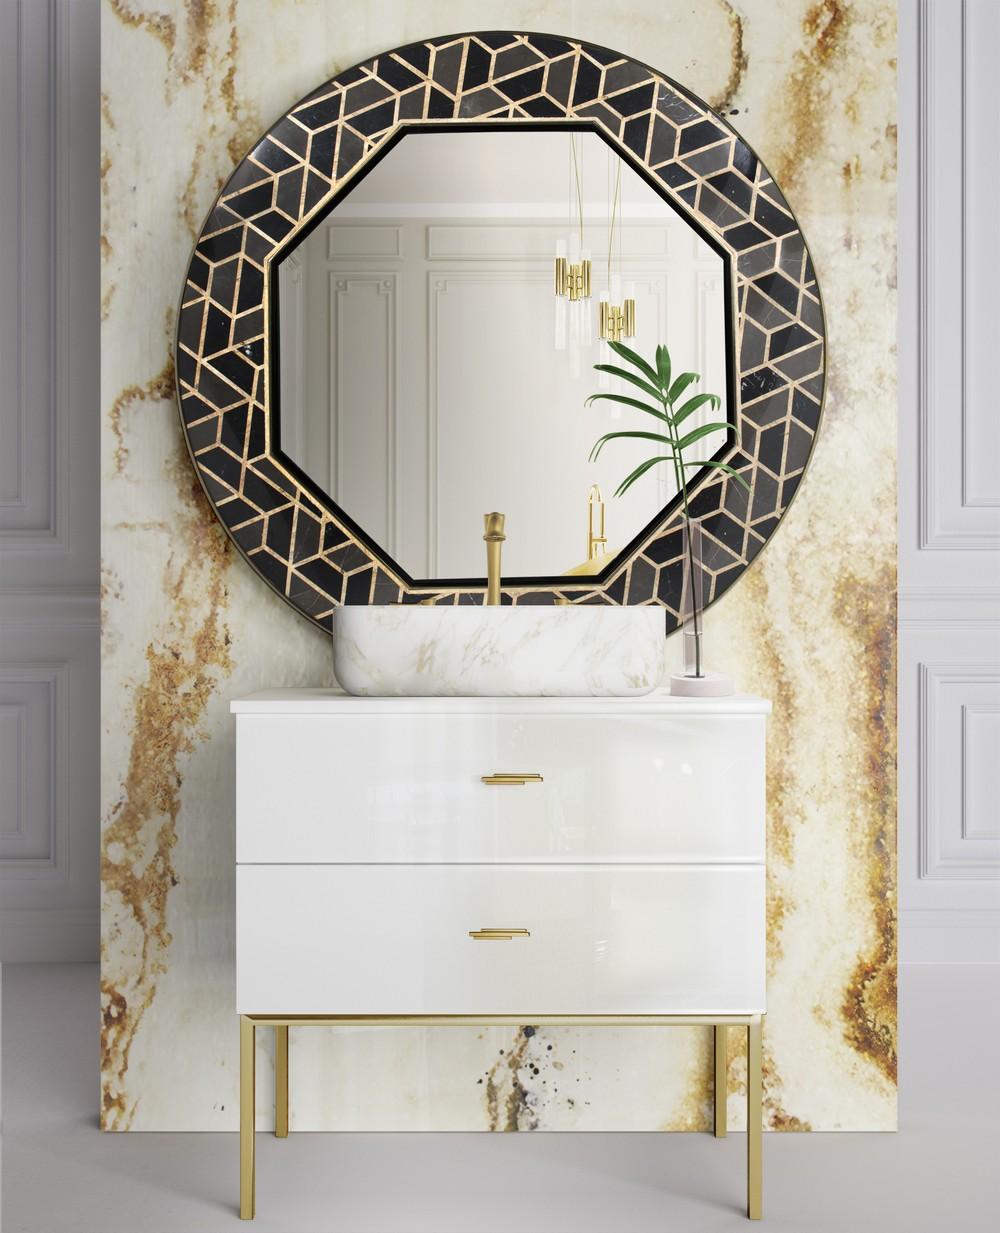 Bathroom Trends 8 Ingenious Design Ideas to Create a Stylish Interior_7 bathroom trends Bathroom Trends: 8 Ingenious Design Ideas to Create a Stylish Interior Bathroom Trends 8 Ingenious Design Ideas to Create a Stylish Interior 7